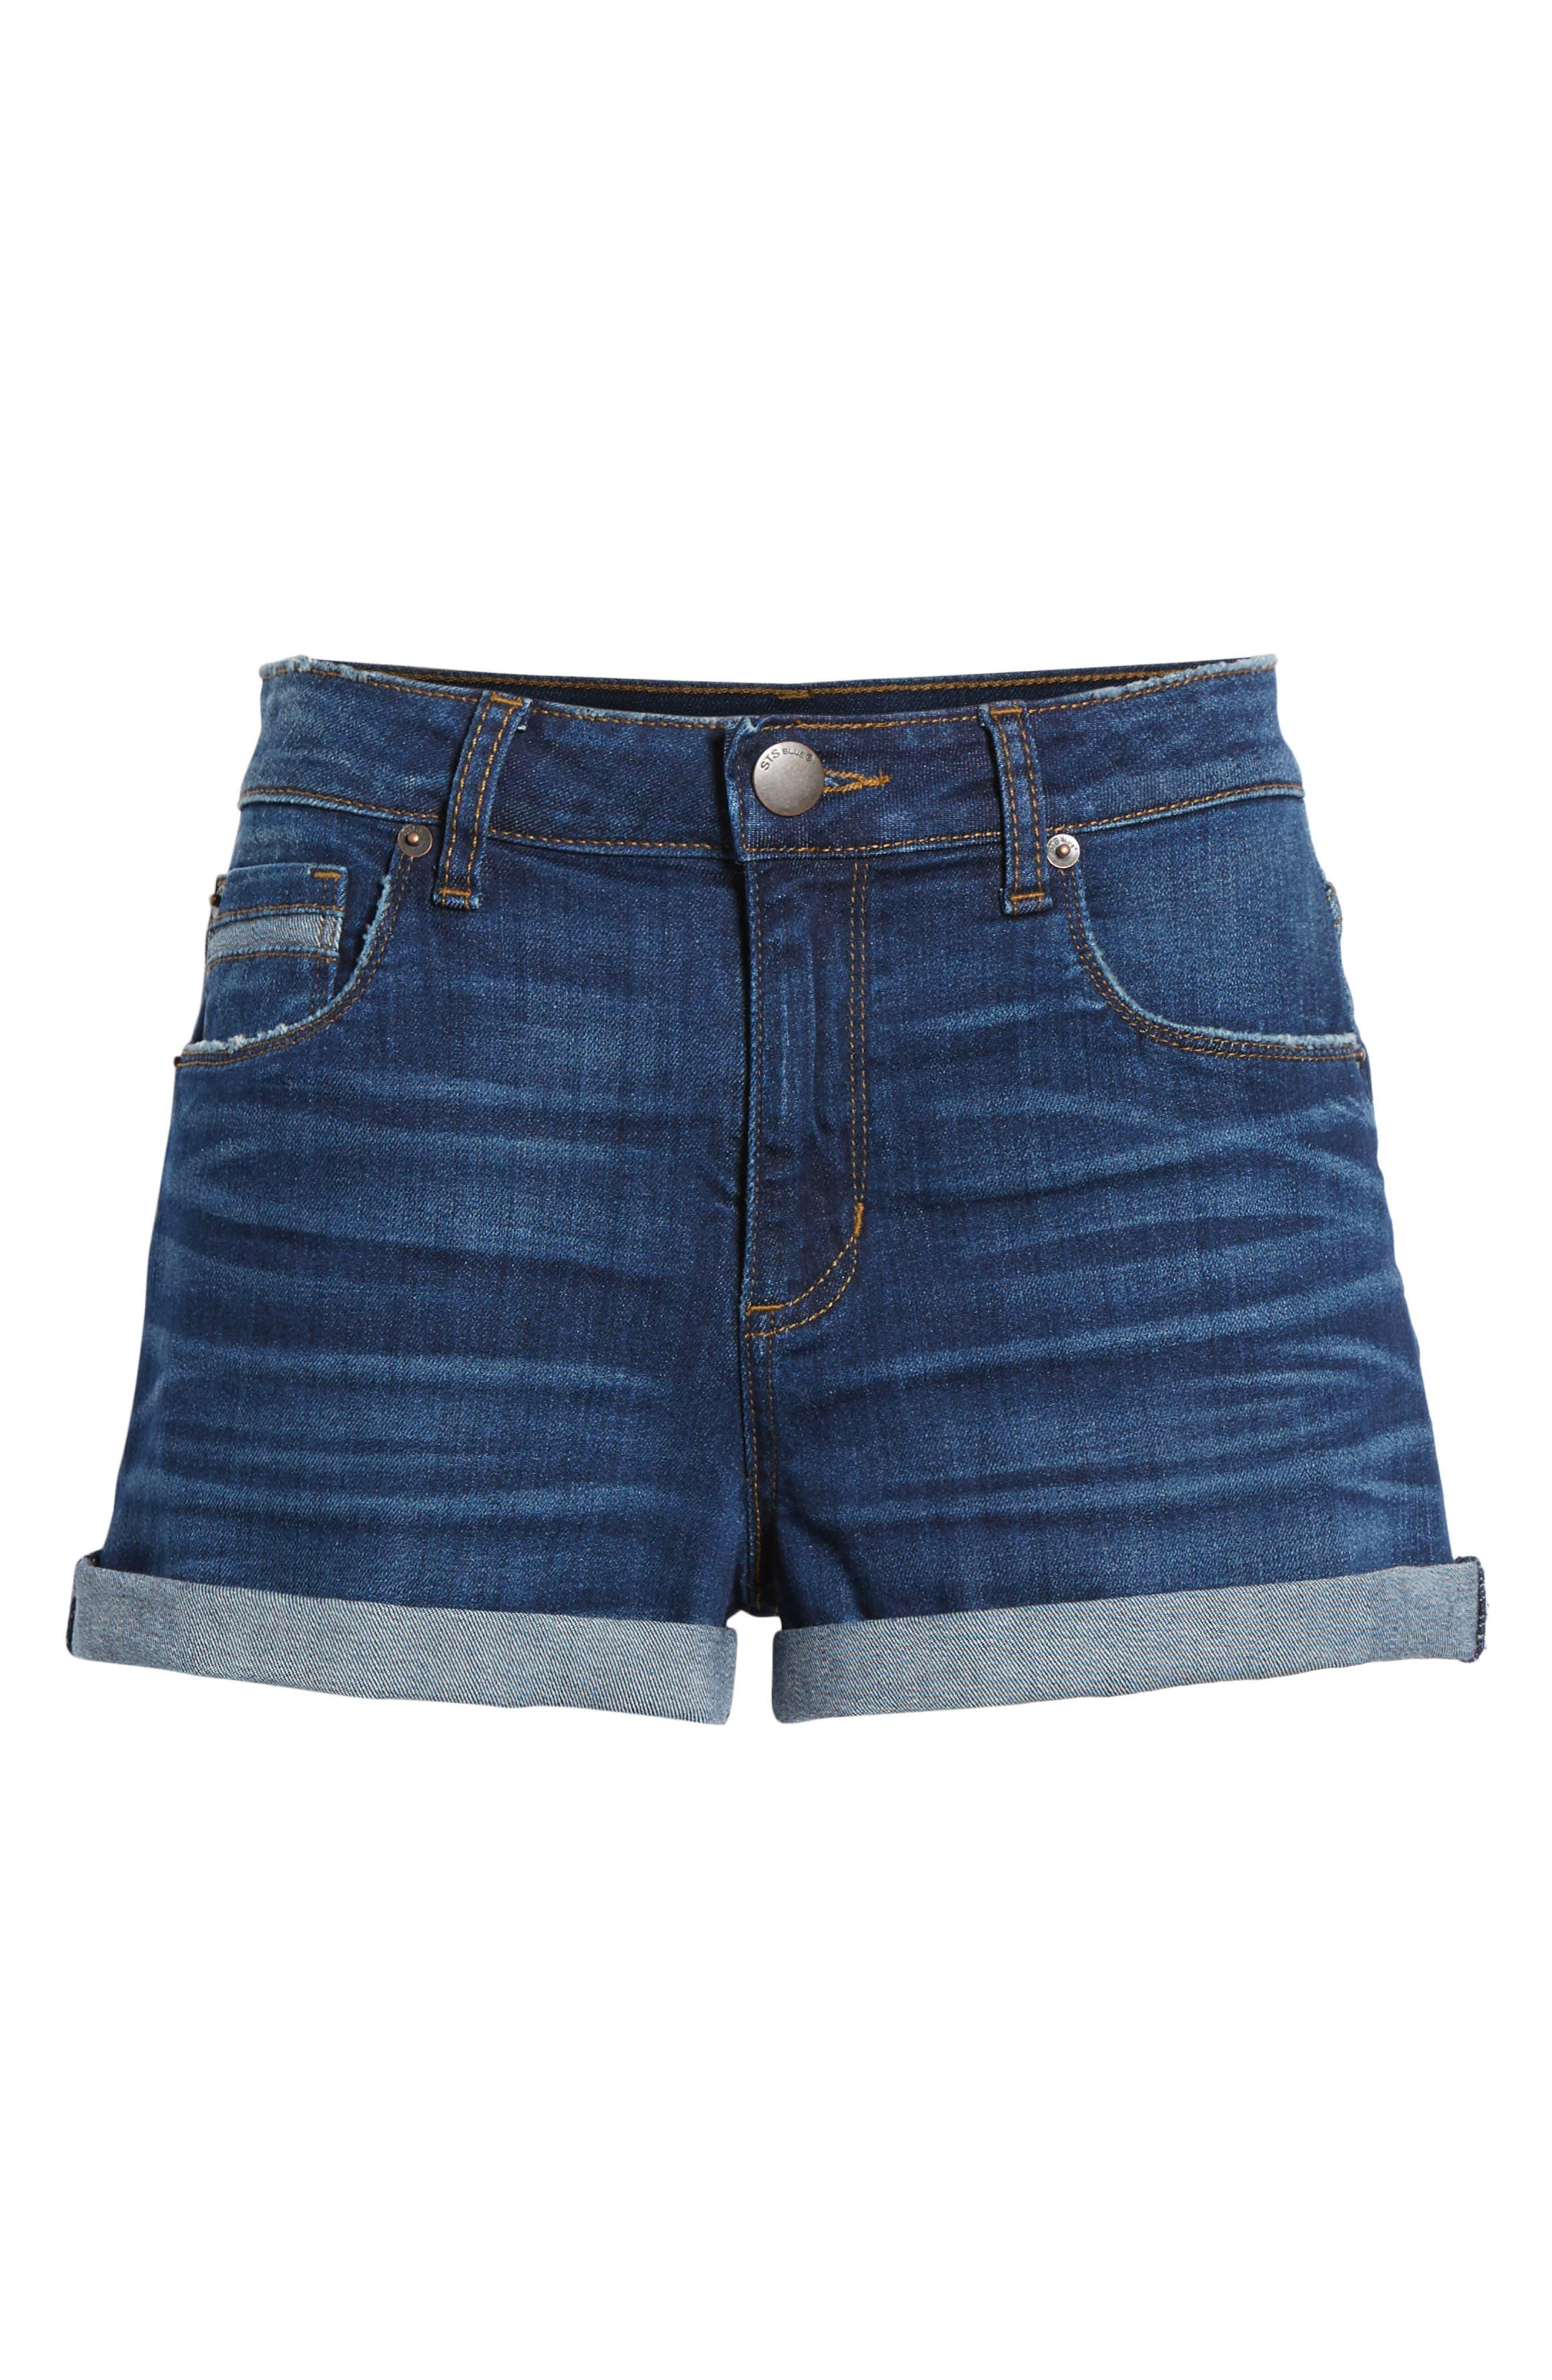 Rose Bowl Cuffed Denim Shorts,                             Alternate thumbnail 7, color,                             Sageland